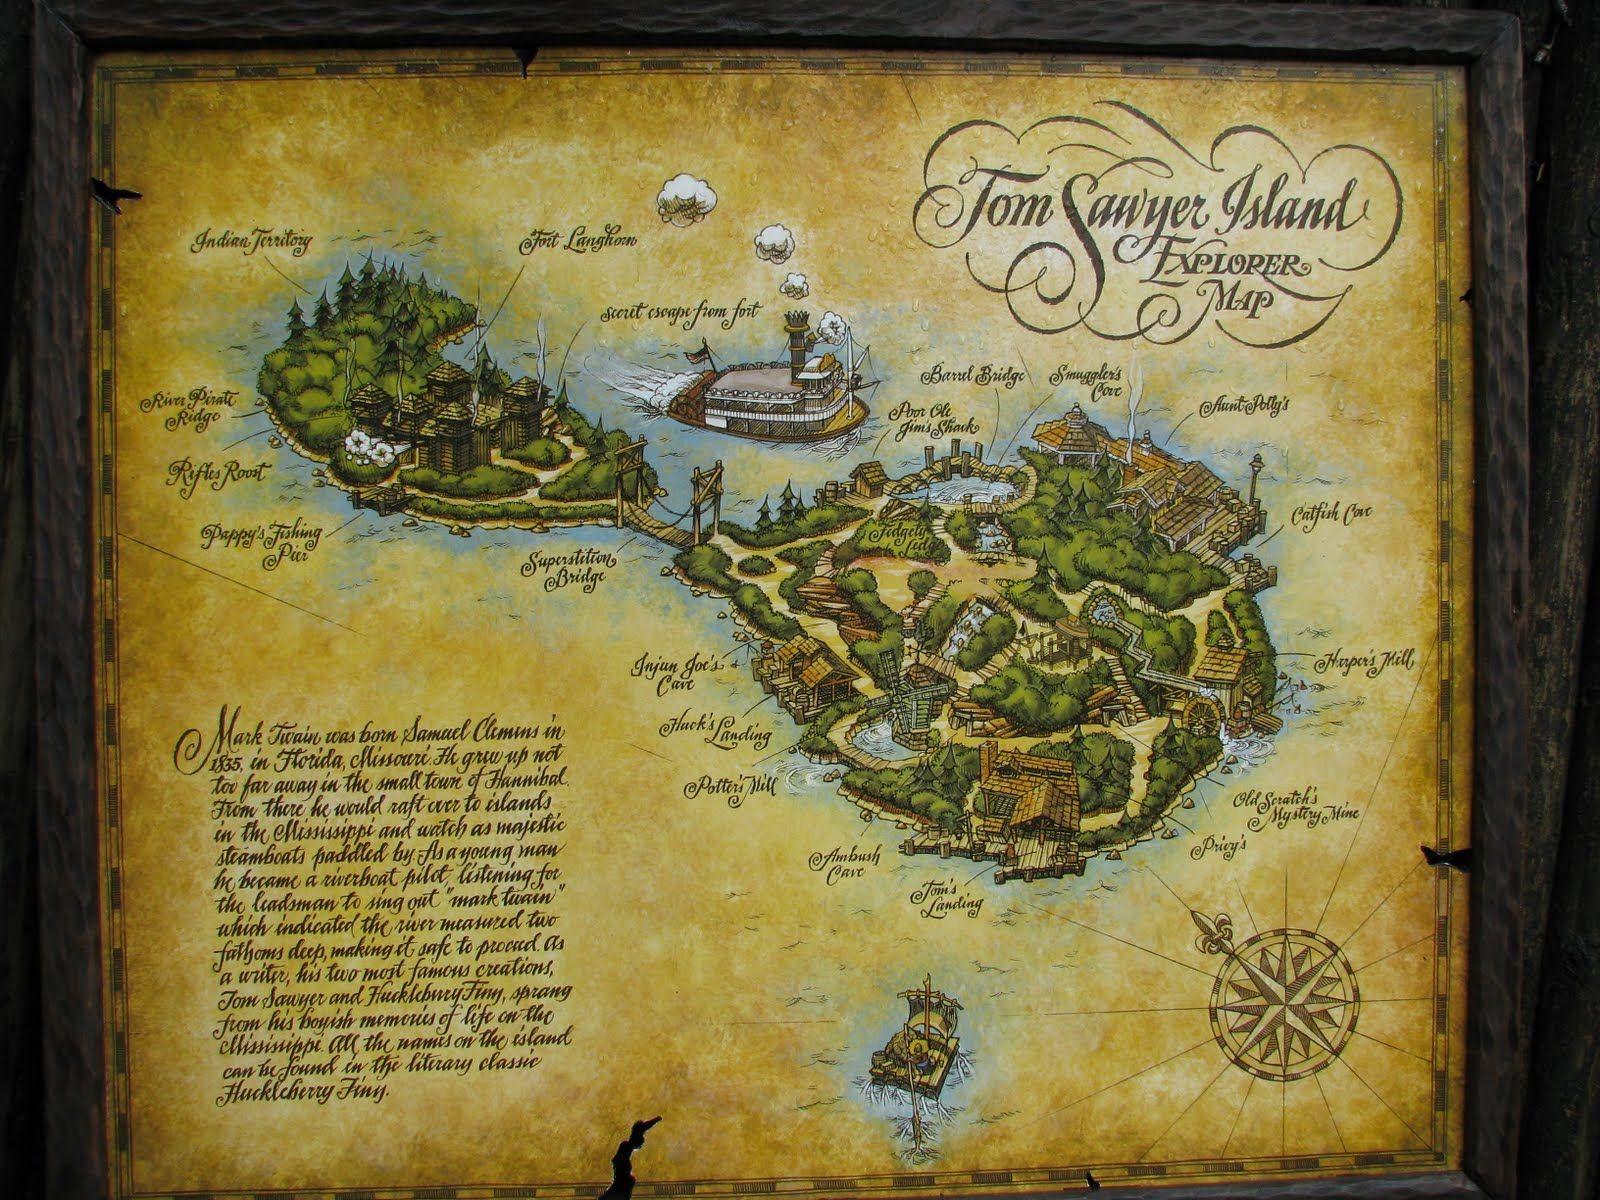 Tom sawyer island magic kingdoms tom sawyer island gives kids a tom sawyer island magic kingdoms tom sawyer island gives kids a chance to play black tomswhite gumiabroncs Choice Image